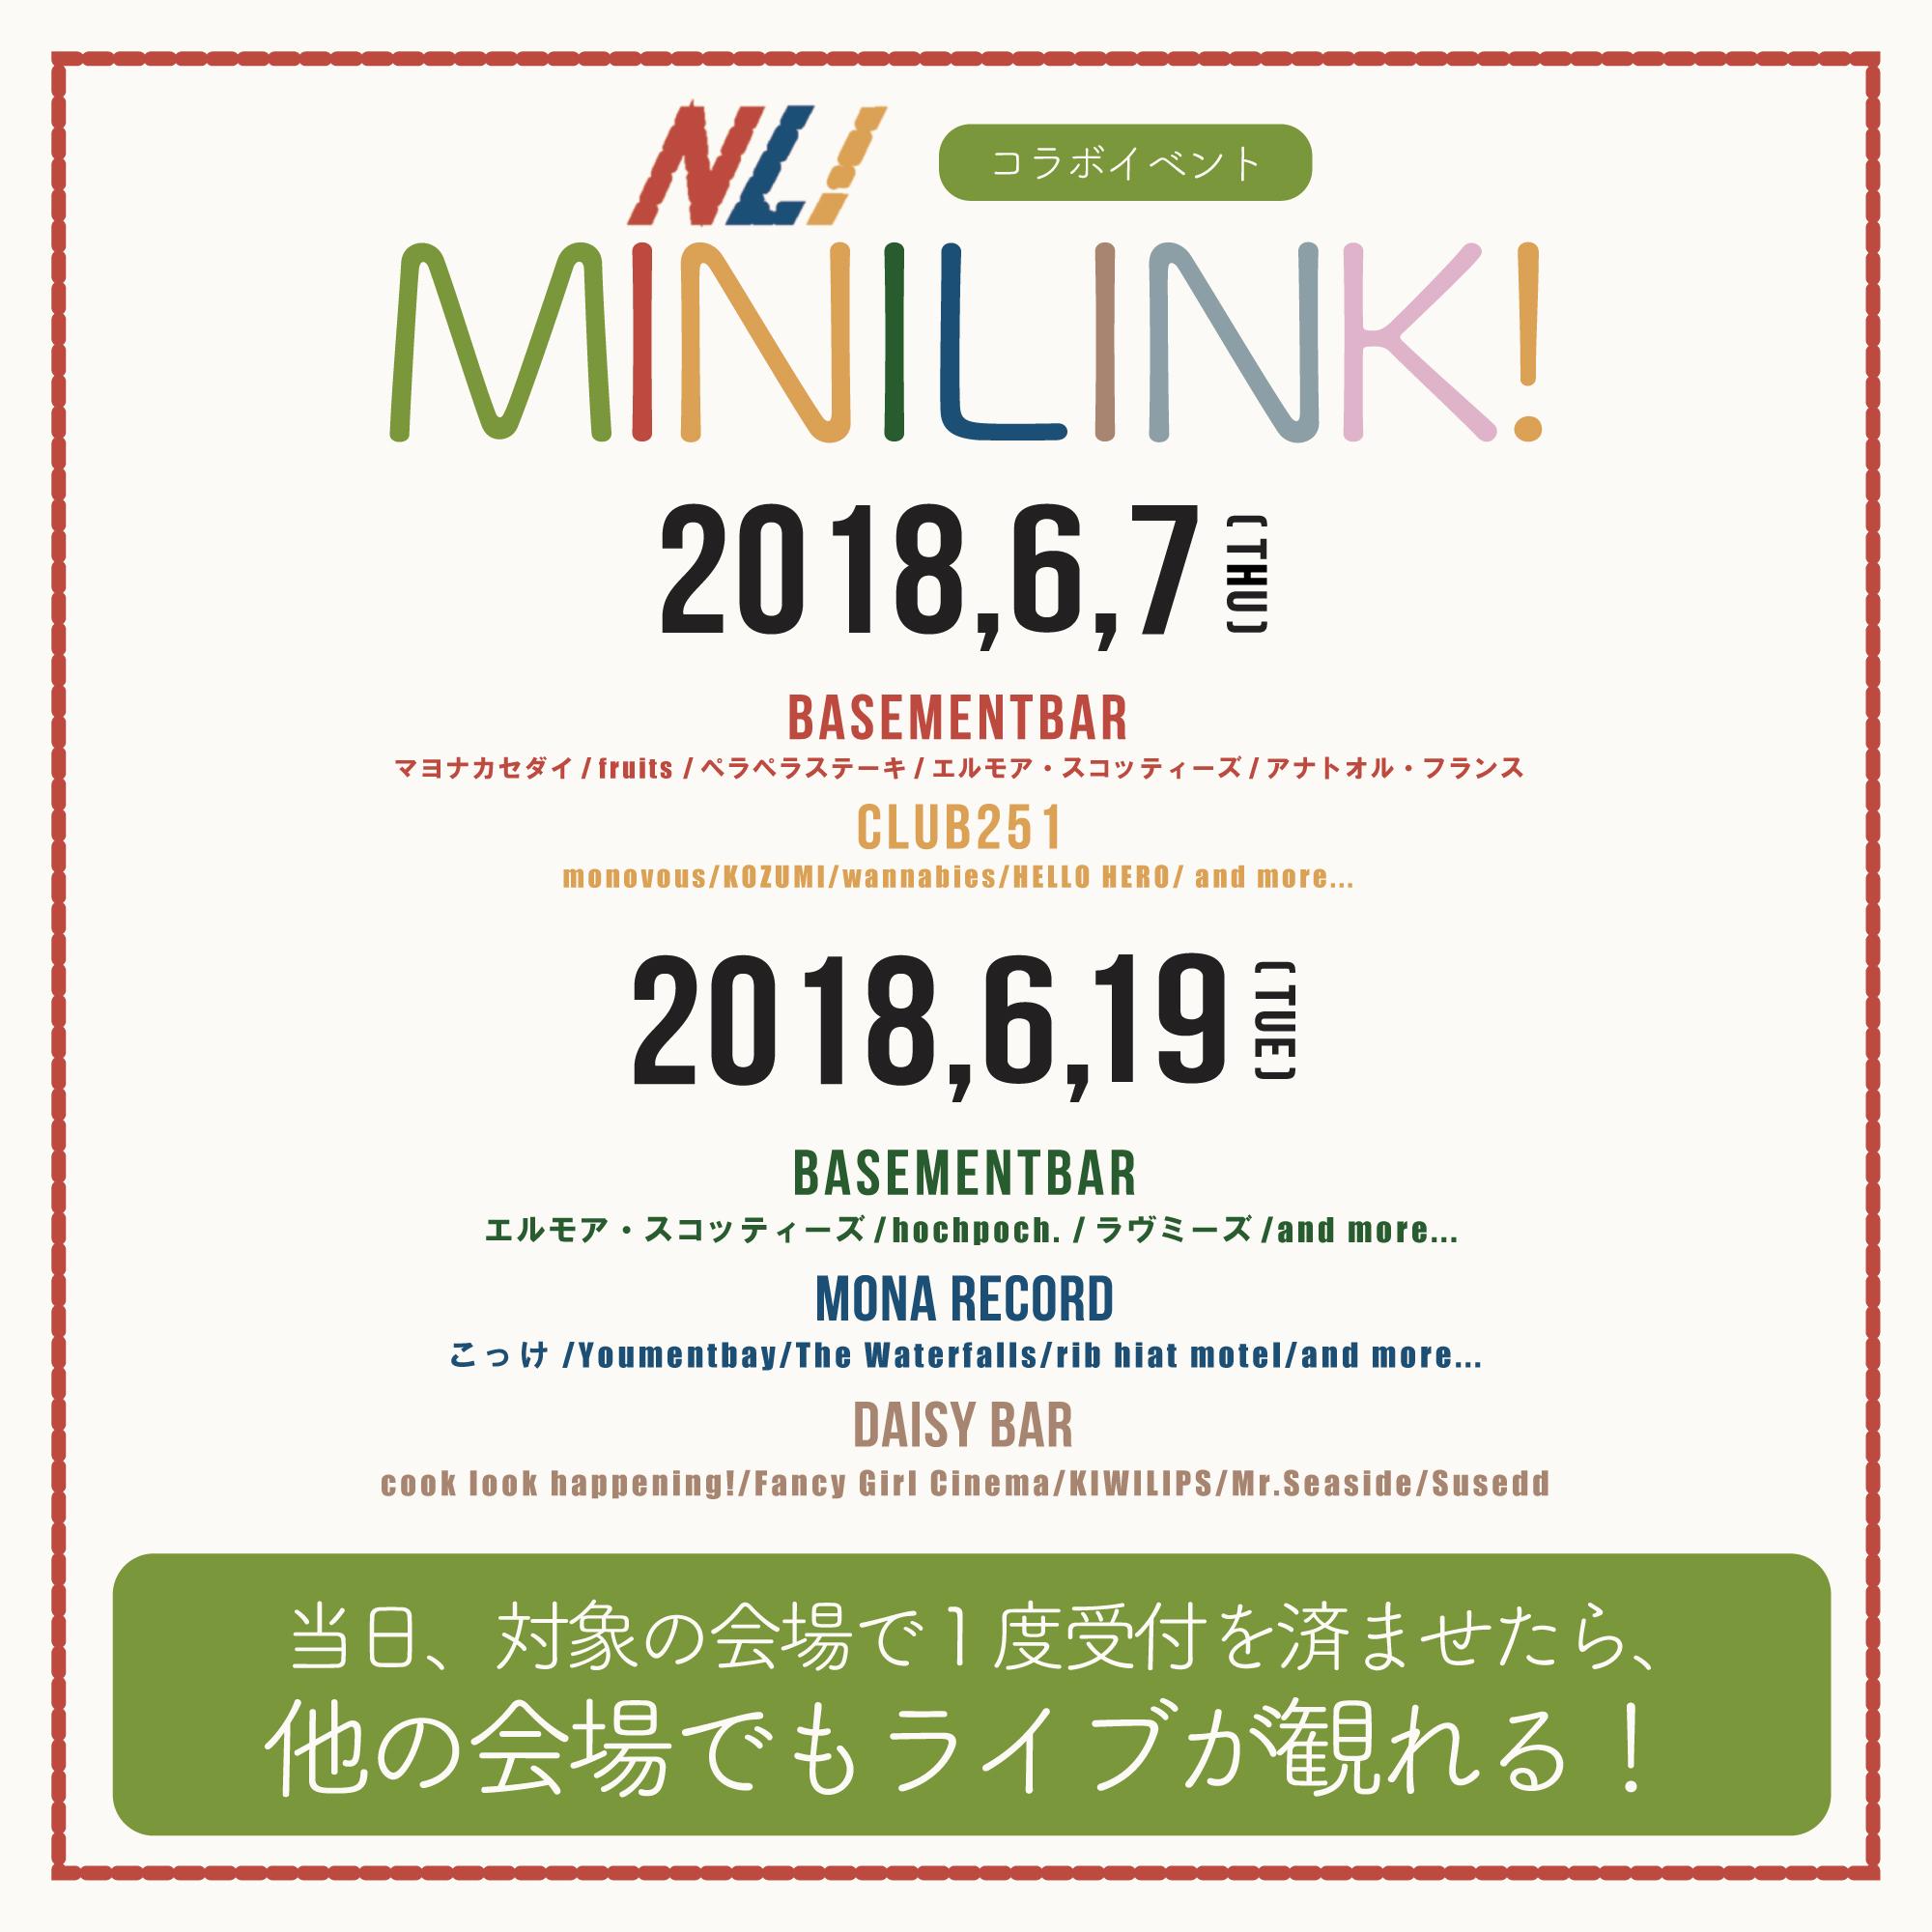 251presents MINILINK!